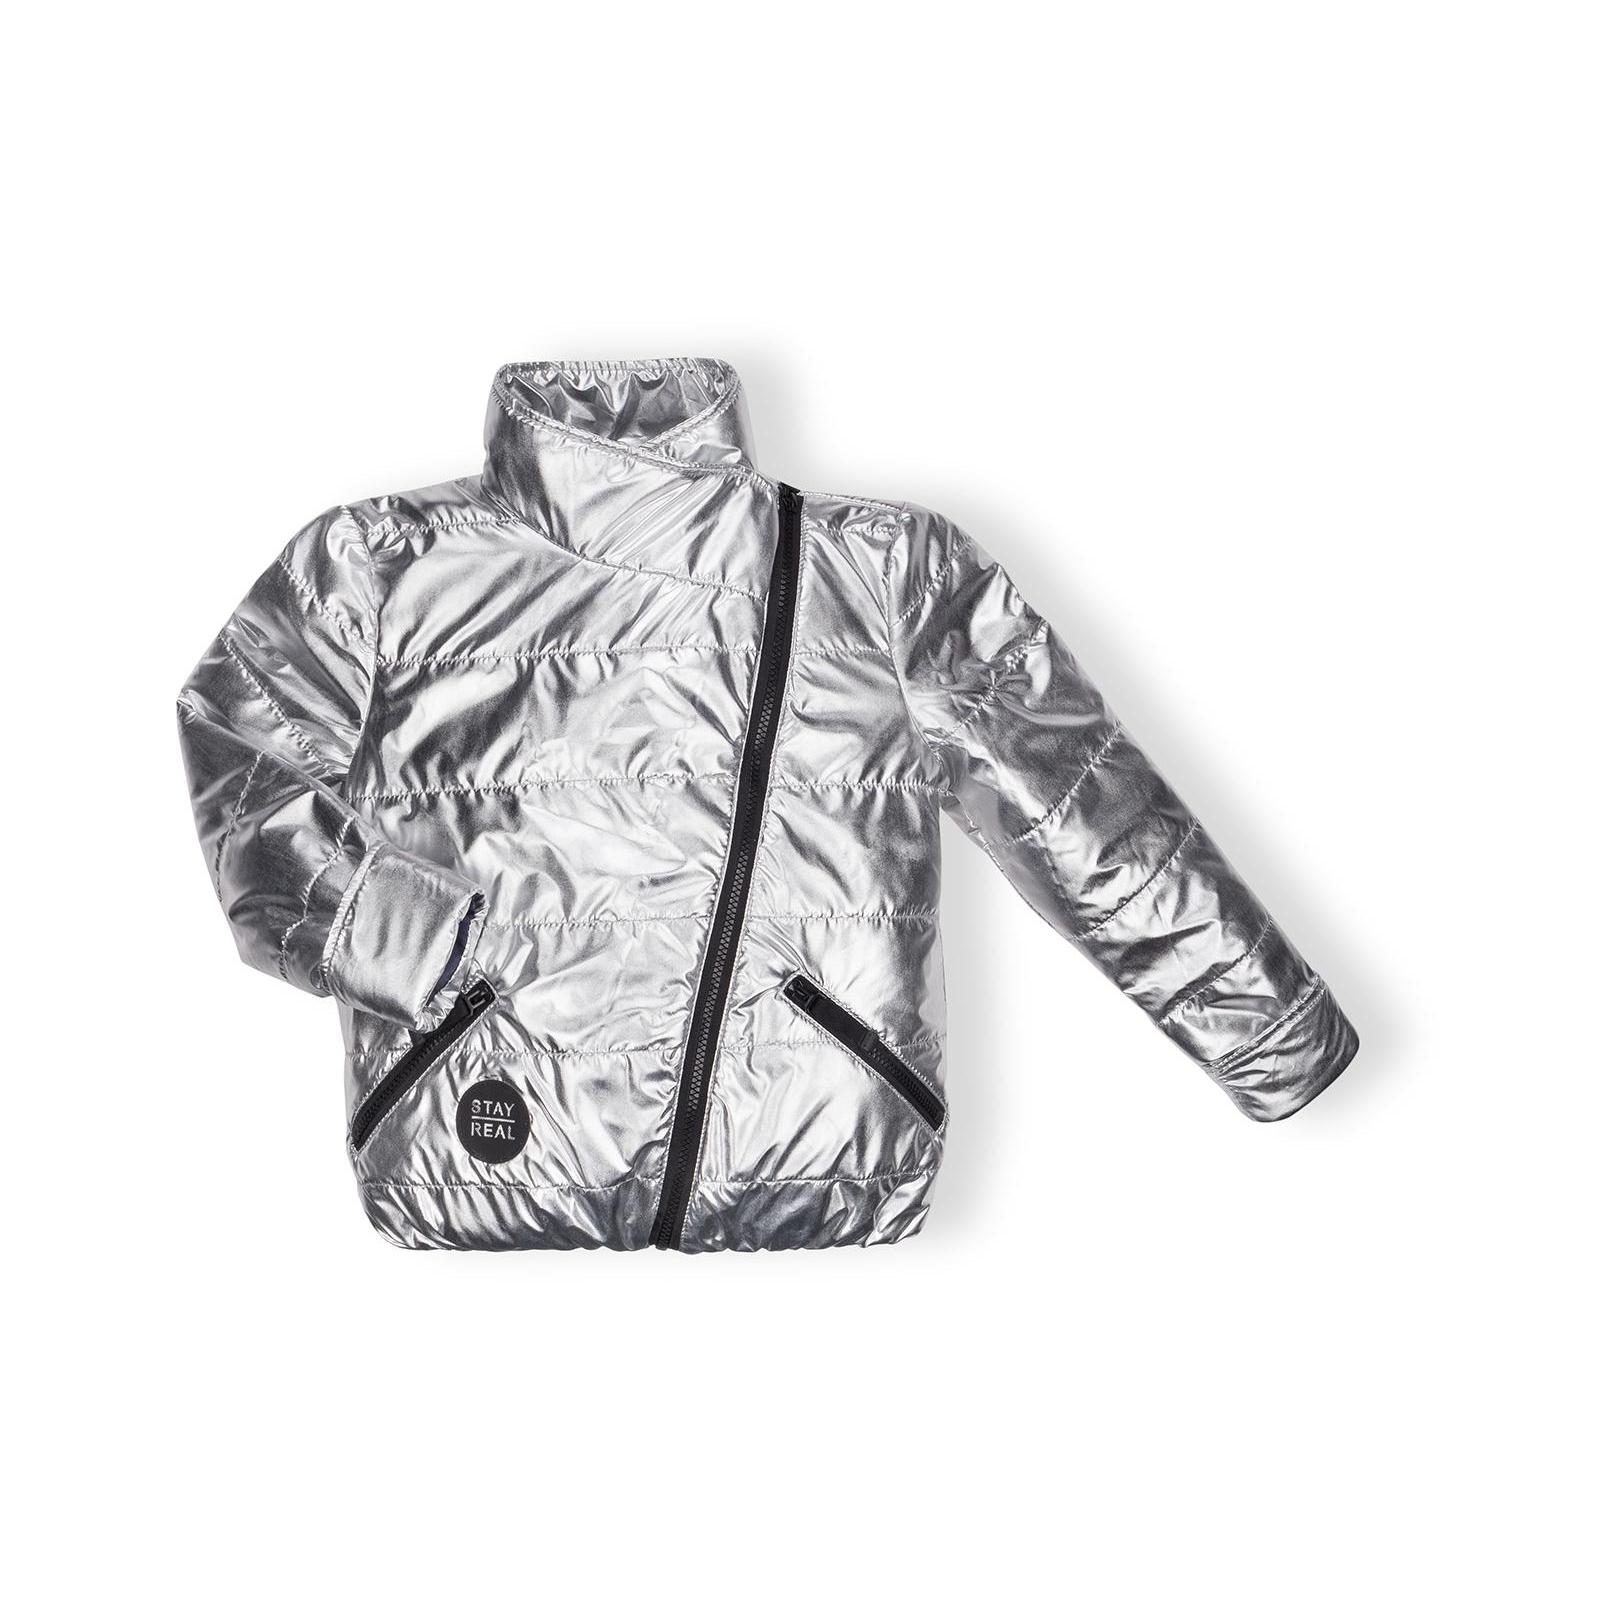 Куртка Brilliant демисезонная (1001-152G-silver)